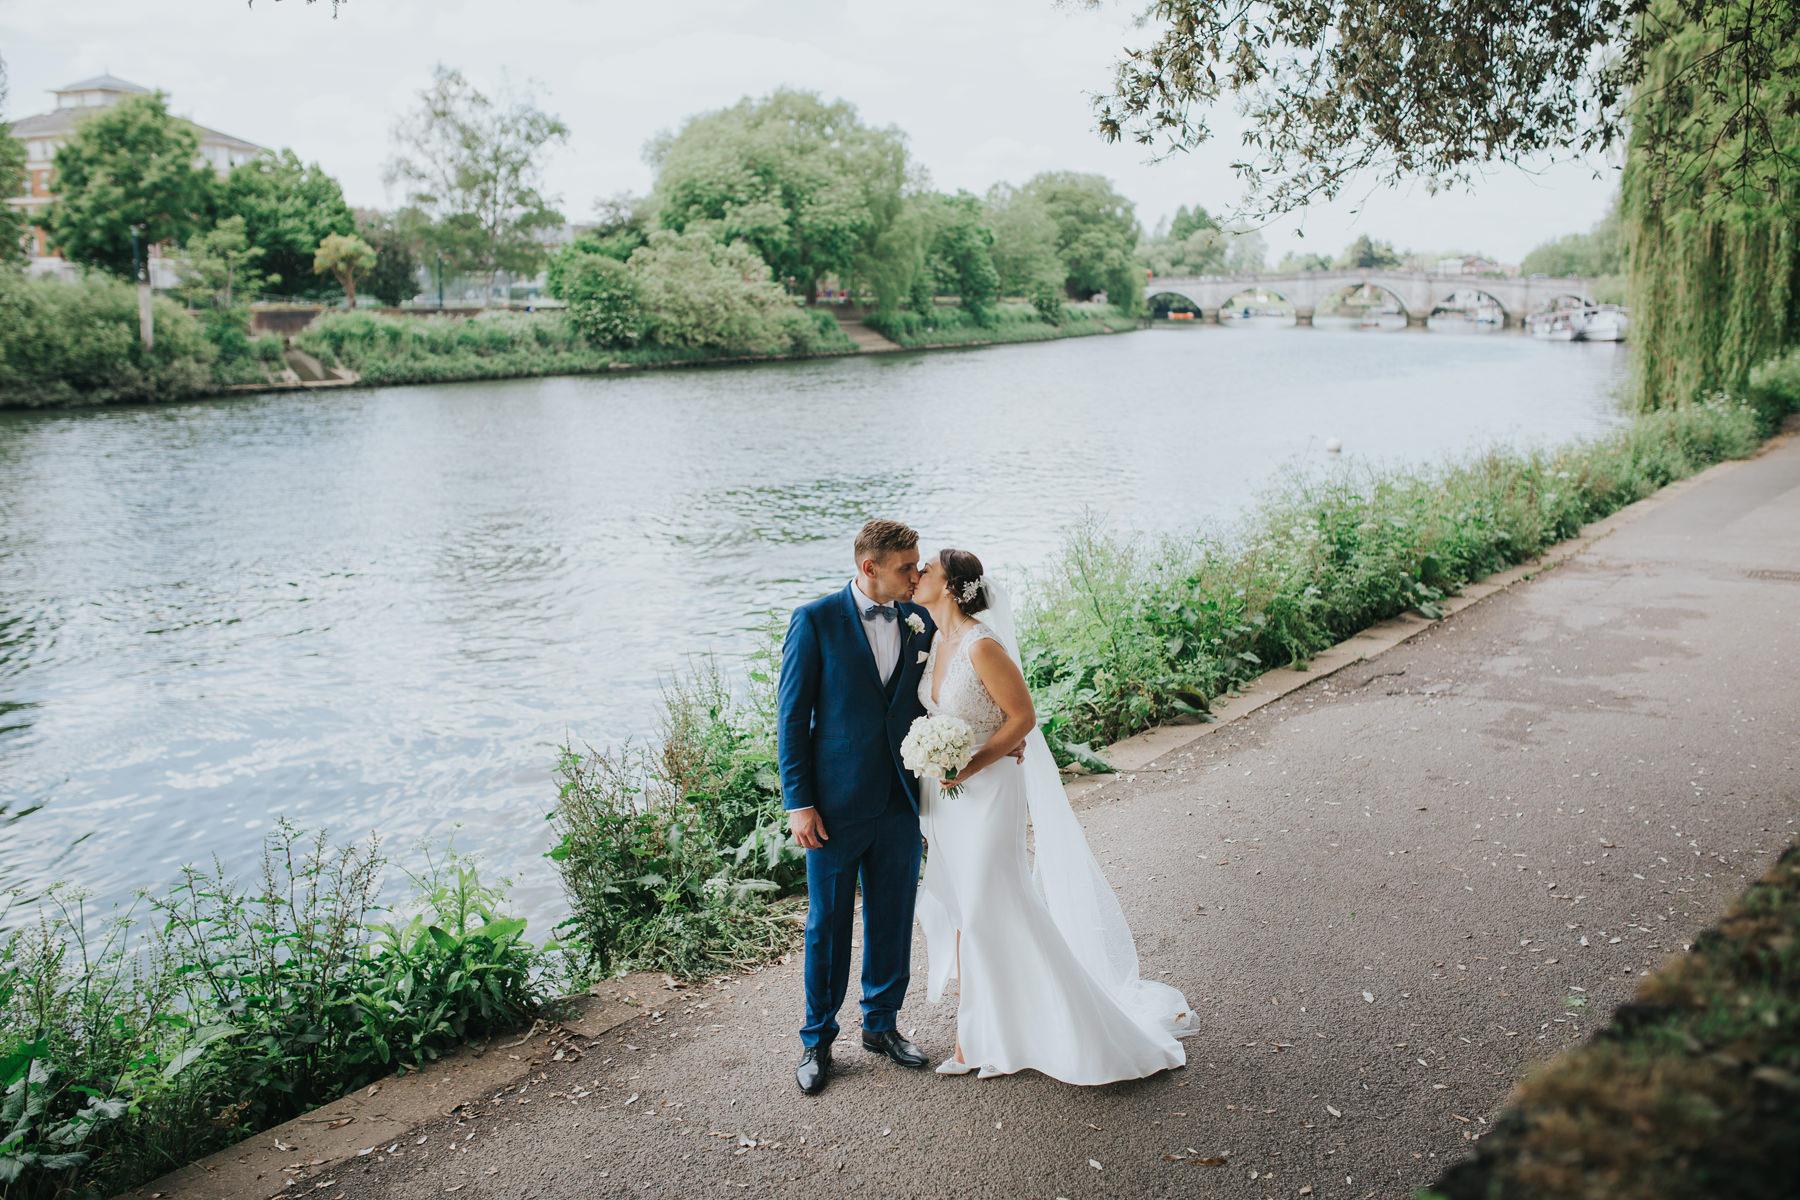 CRL-401-The Bingham wedding Richmond-Claire Rob bridal couple portraits on Thamespath.jpg